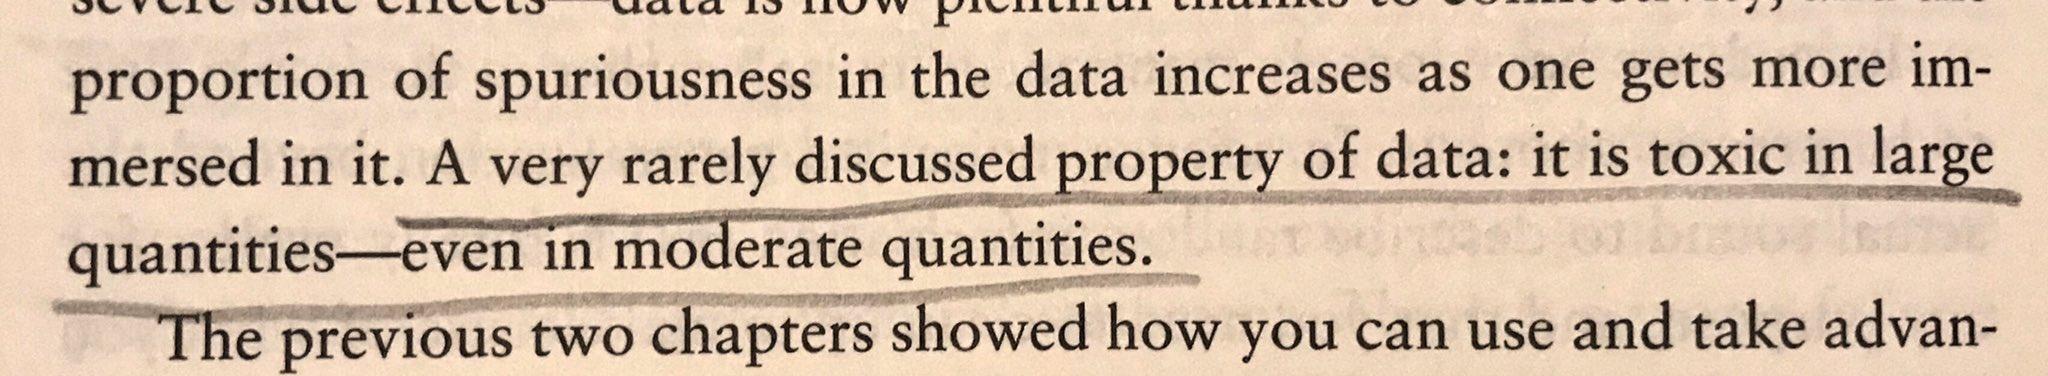 Data - the problem & solution #antifragile #Talebism https://t.co/byWMXQwWUl